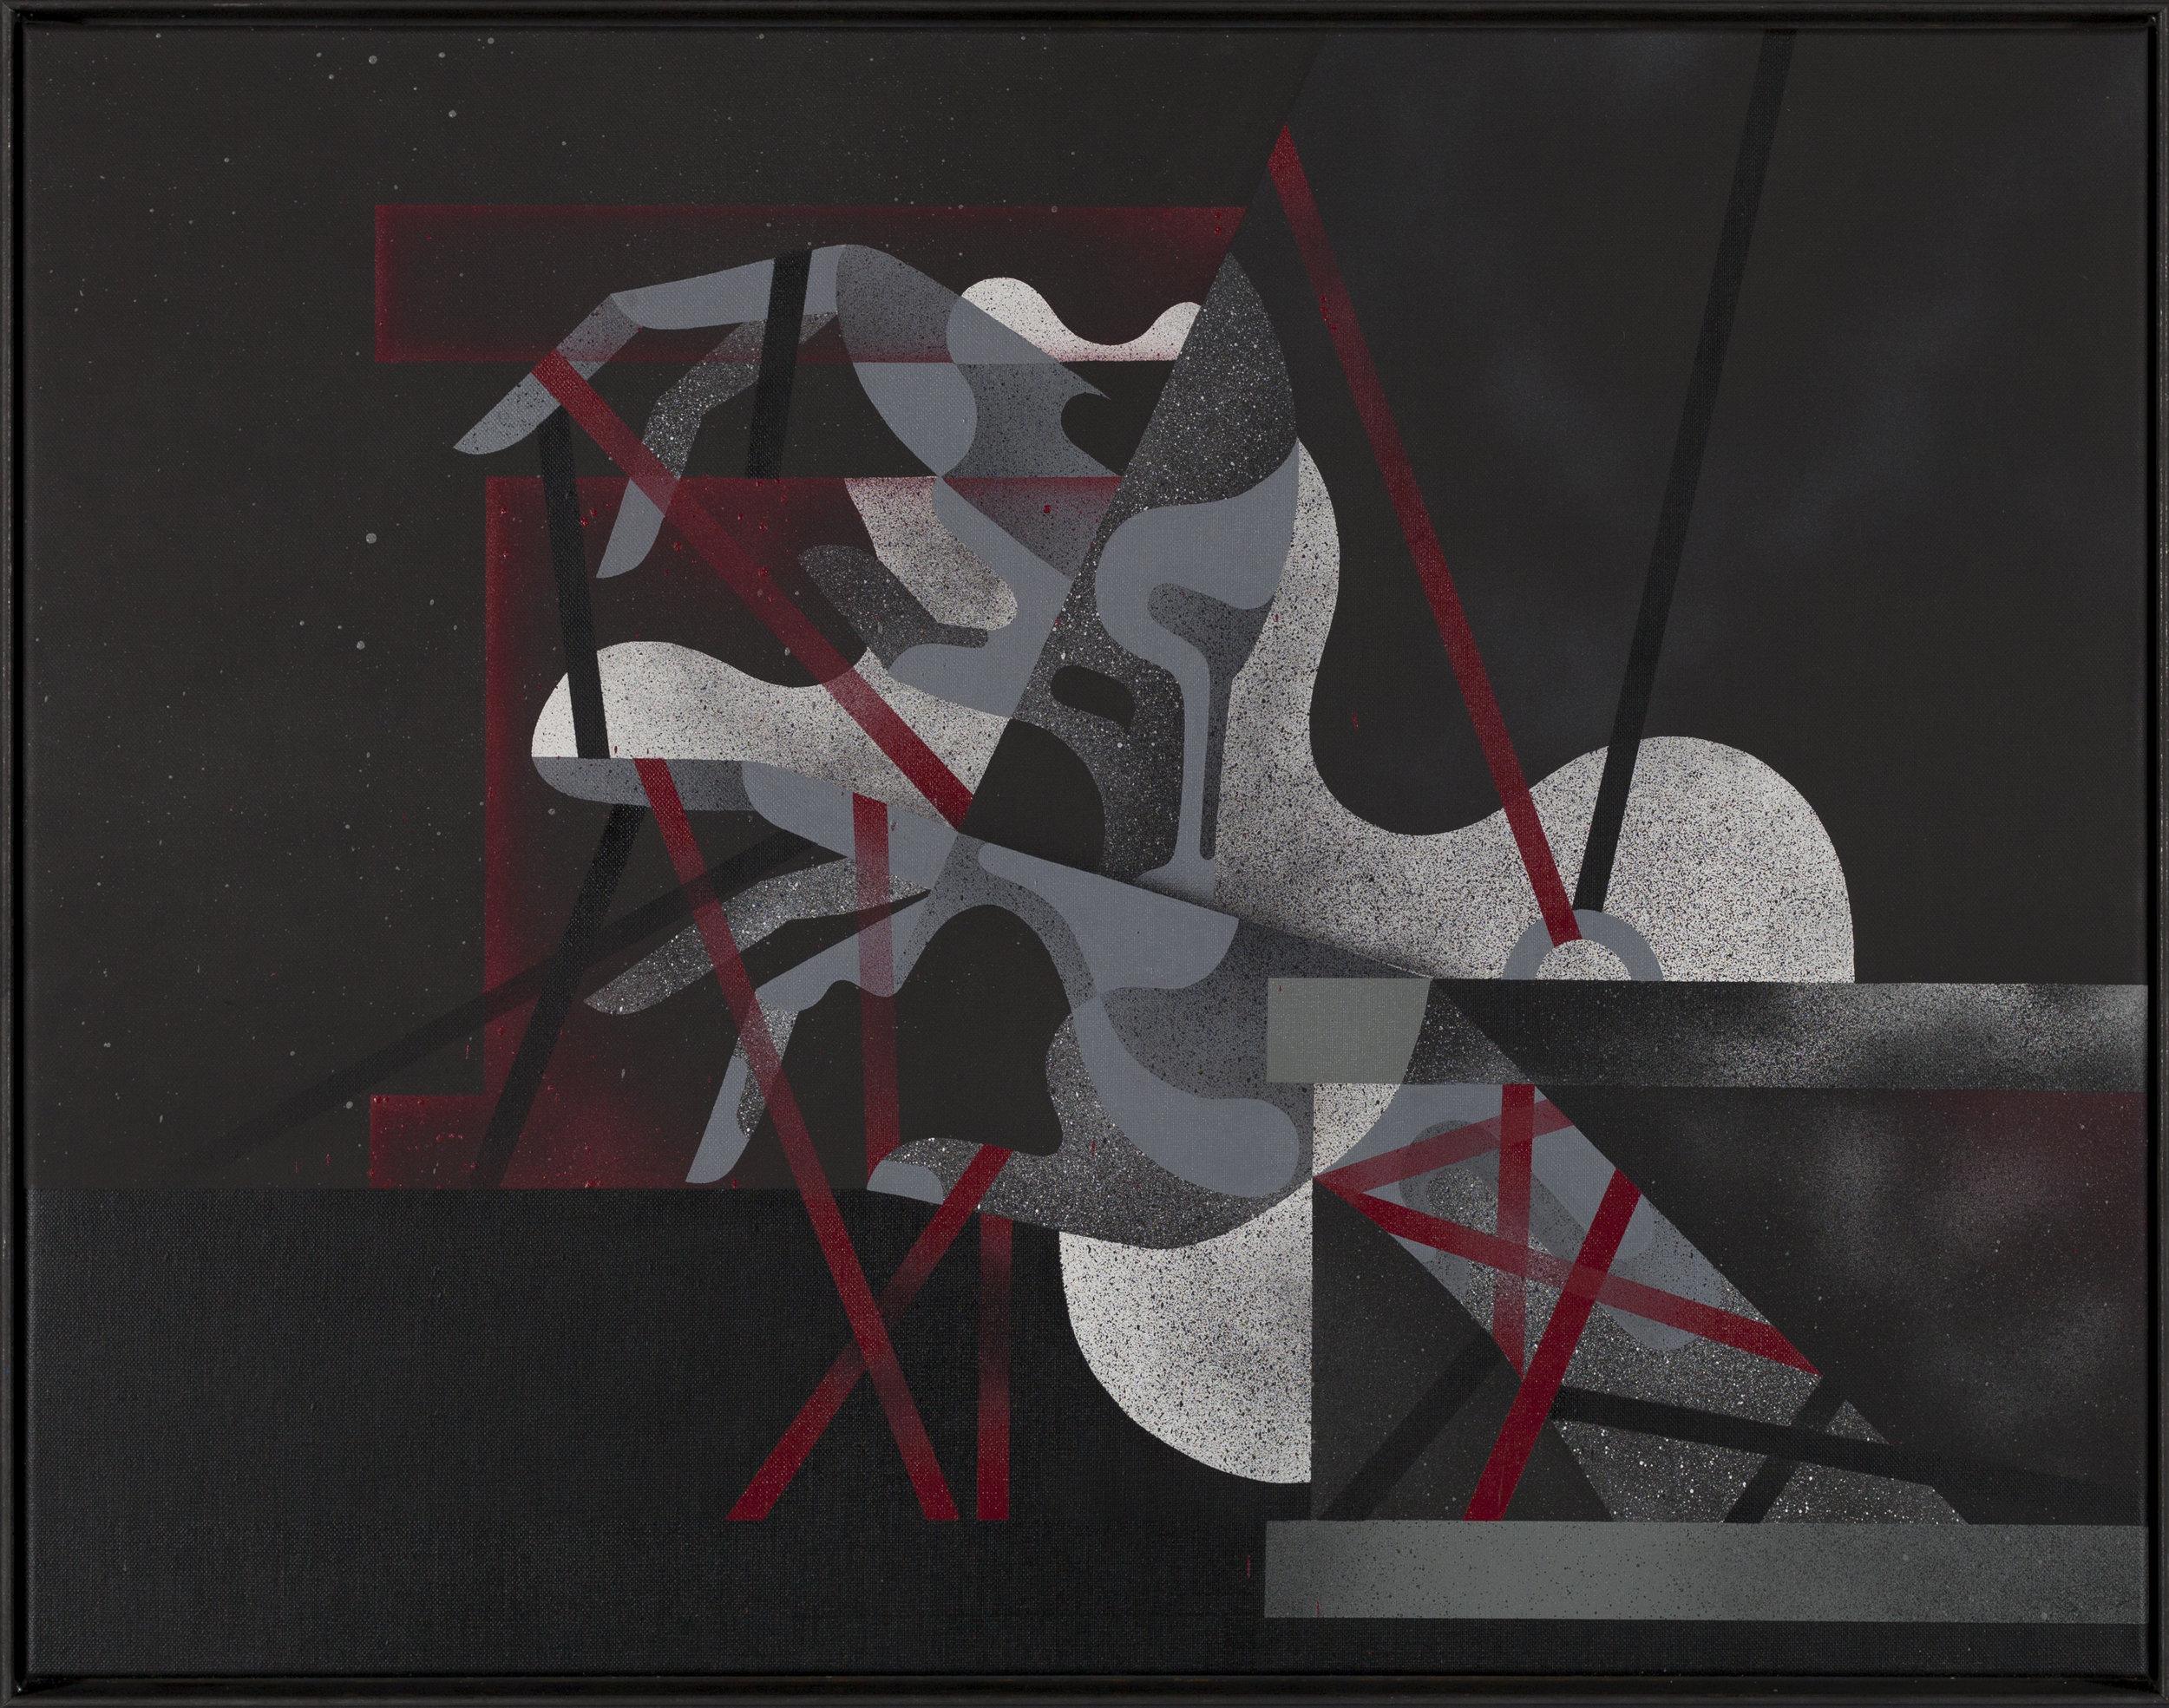 Selbst Binden, Scarlet by James Reka